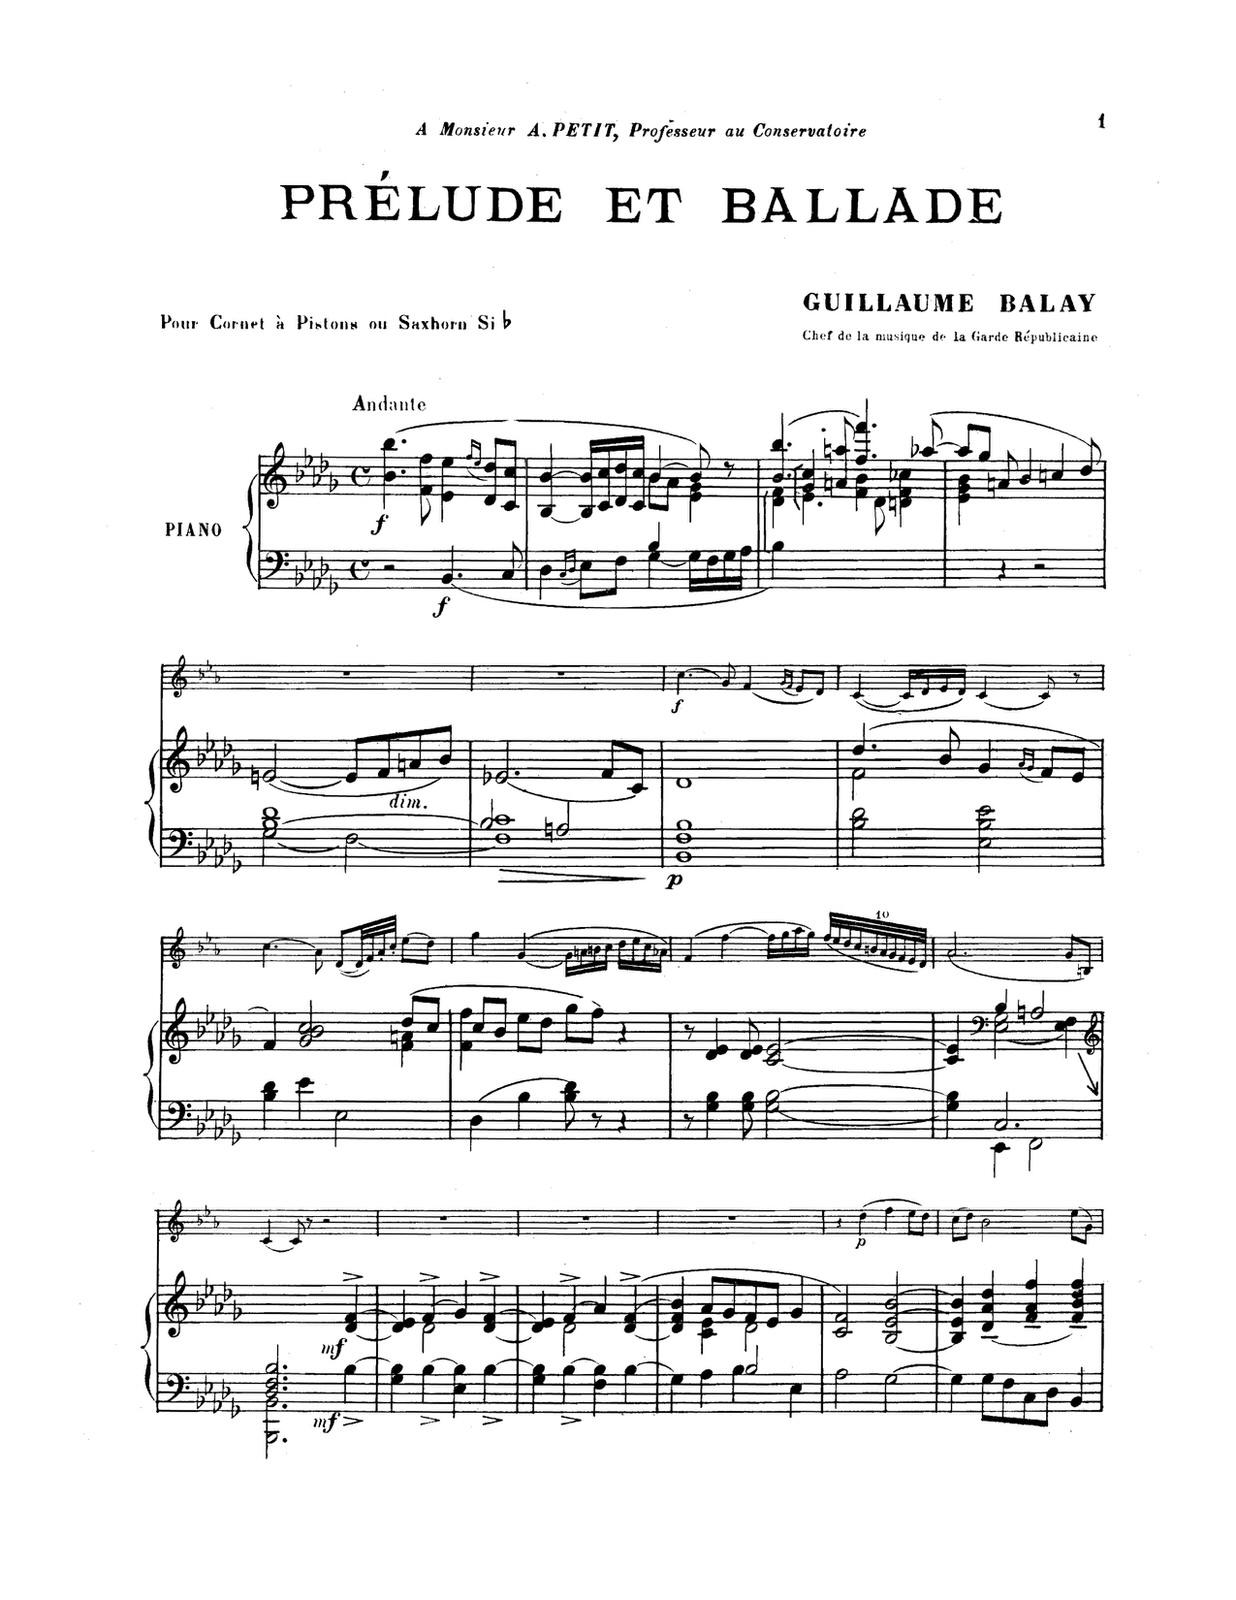 Balay, Prelude and Ballade PDF